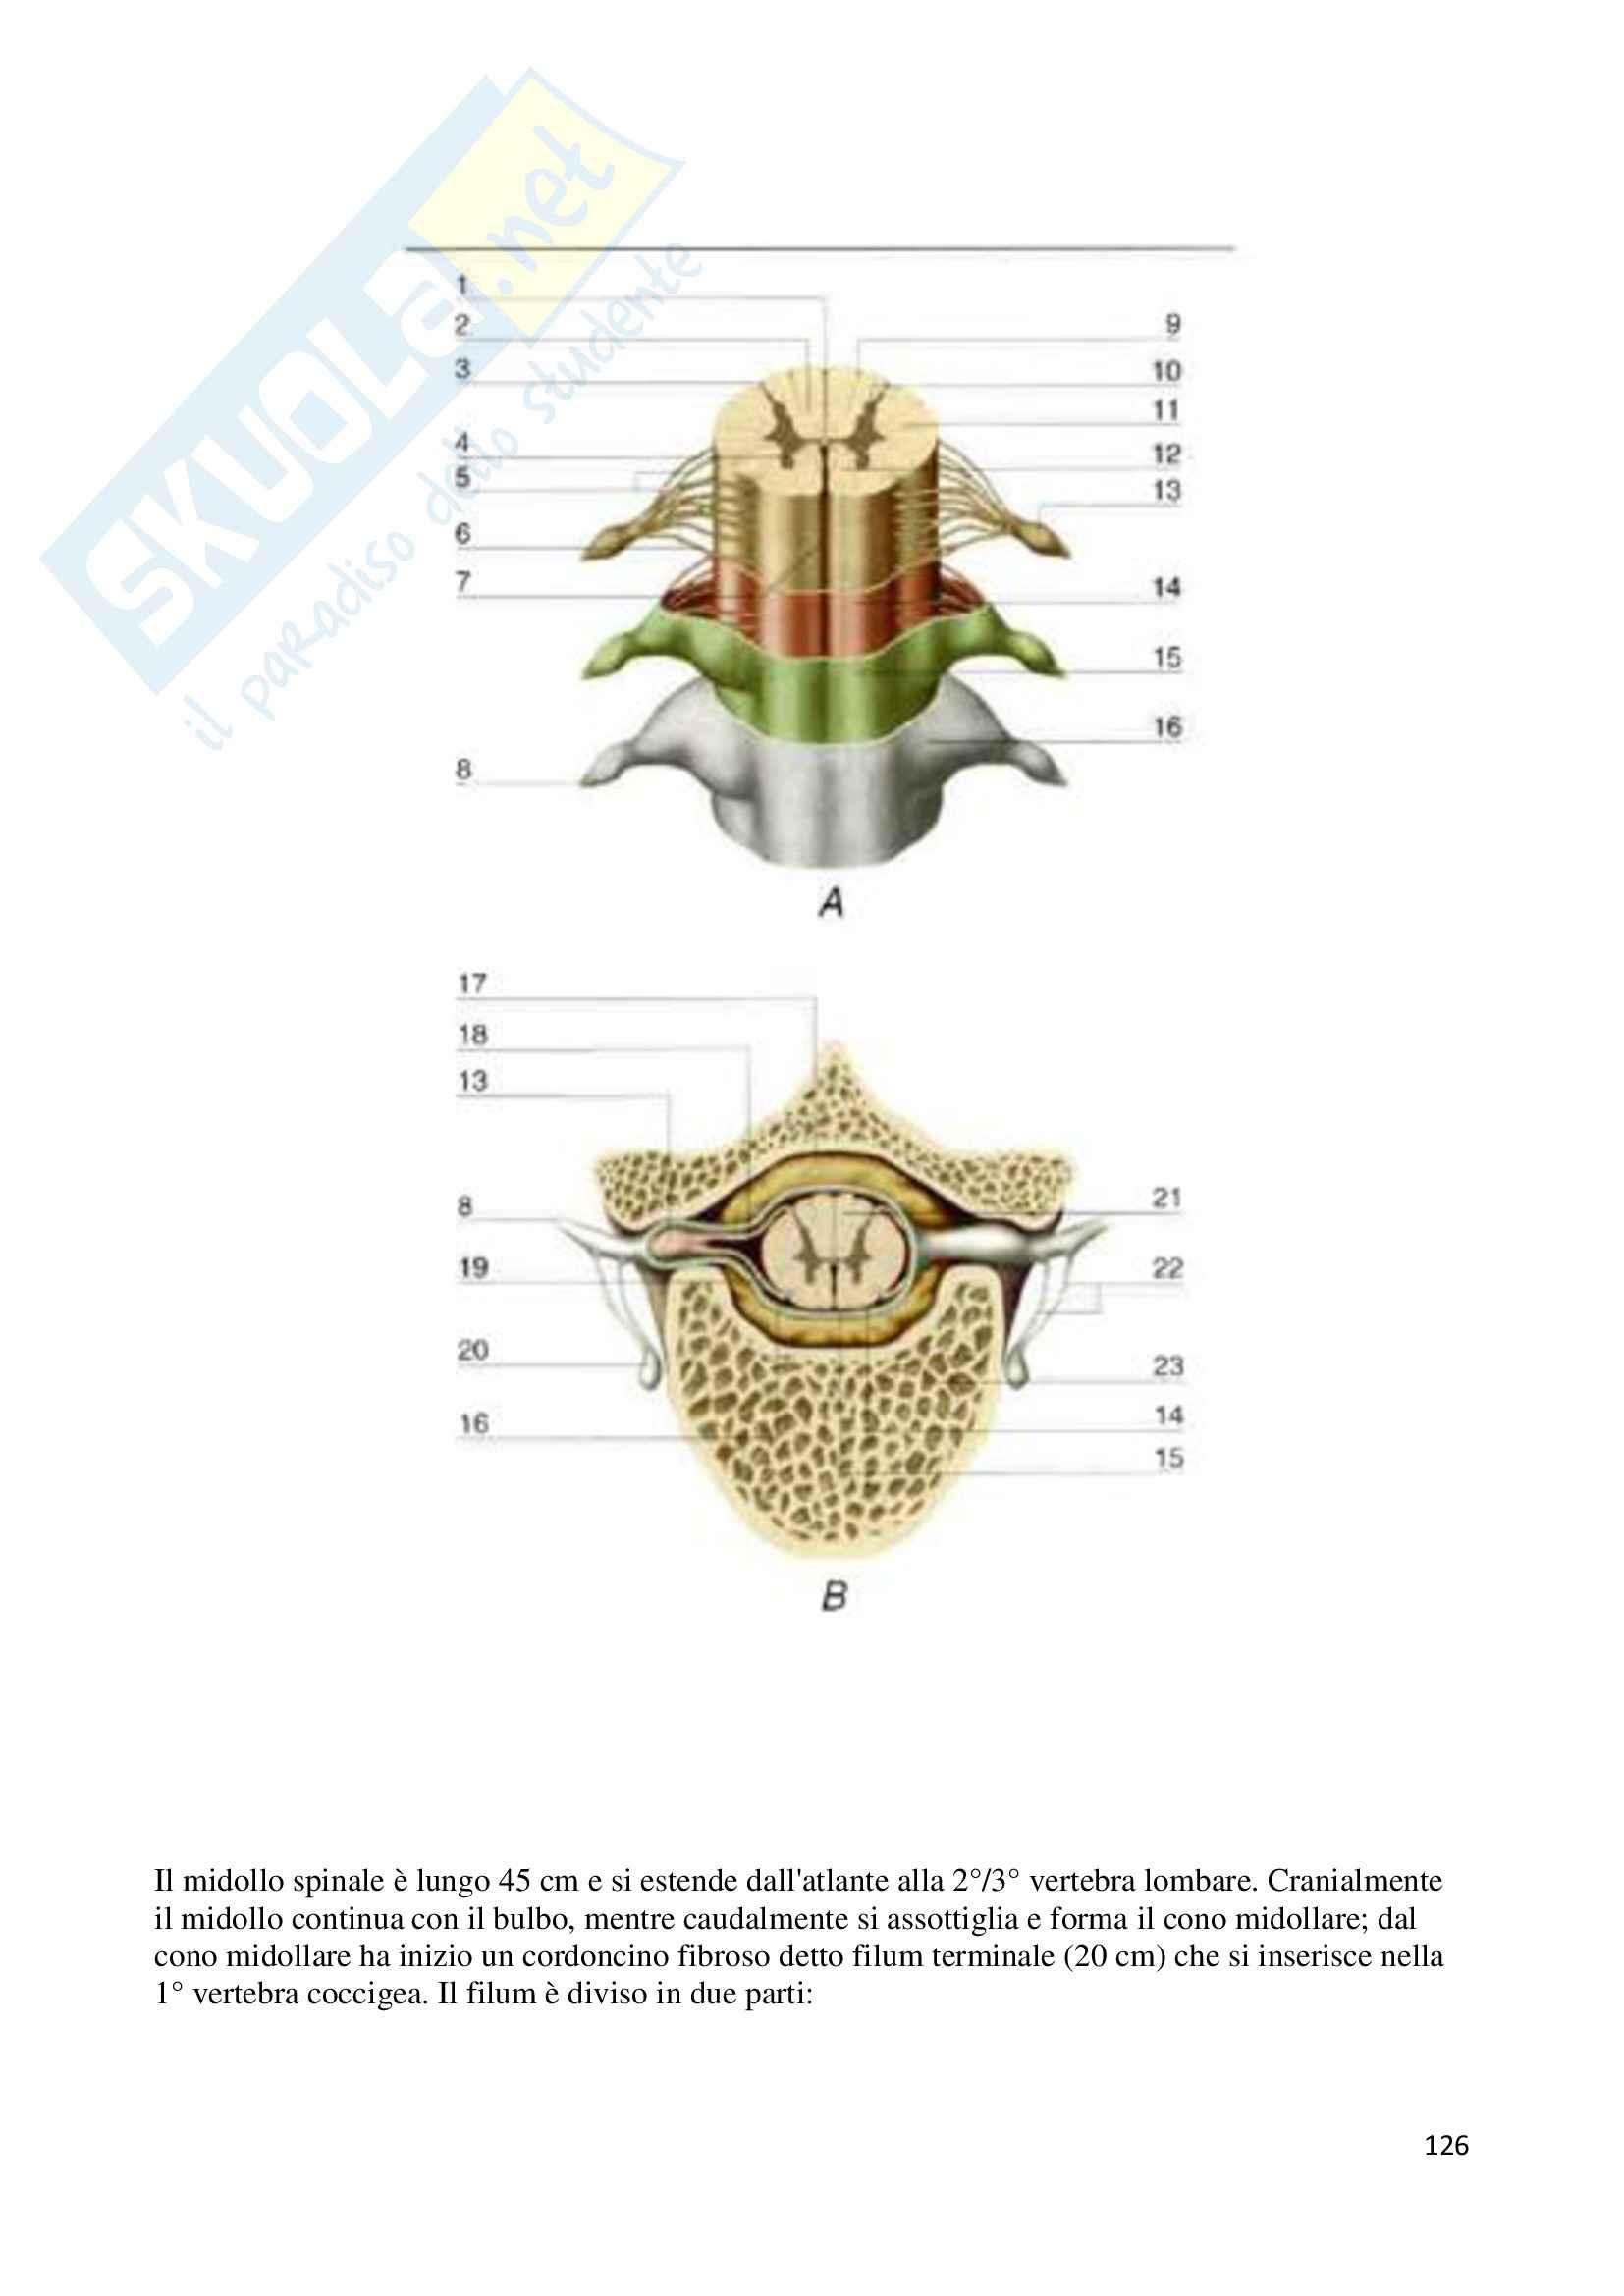 Sistema Nervoso Centrale, Anatomia Pag. 126